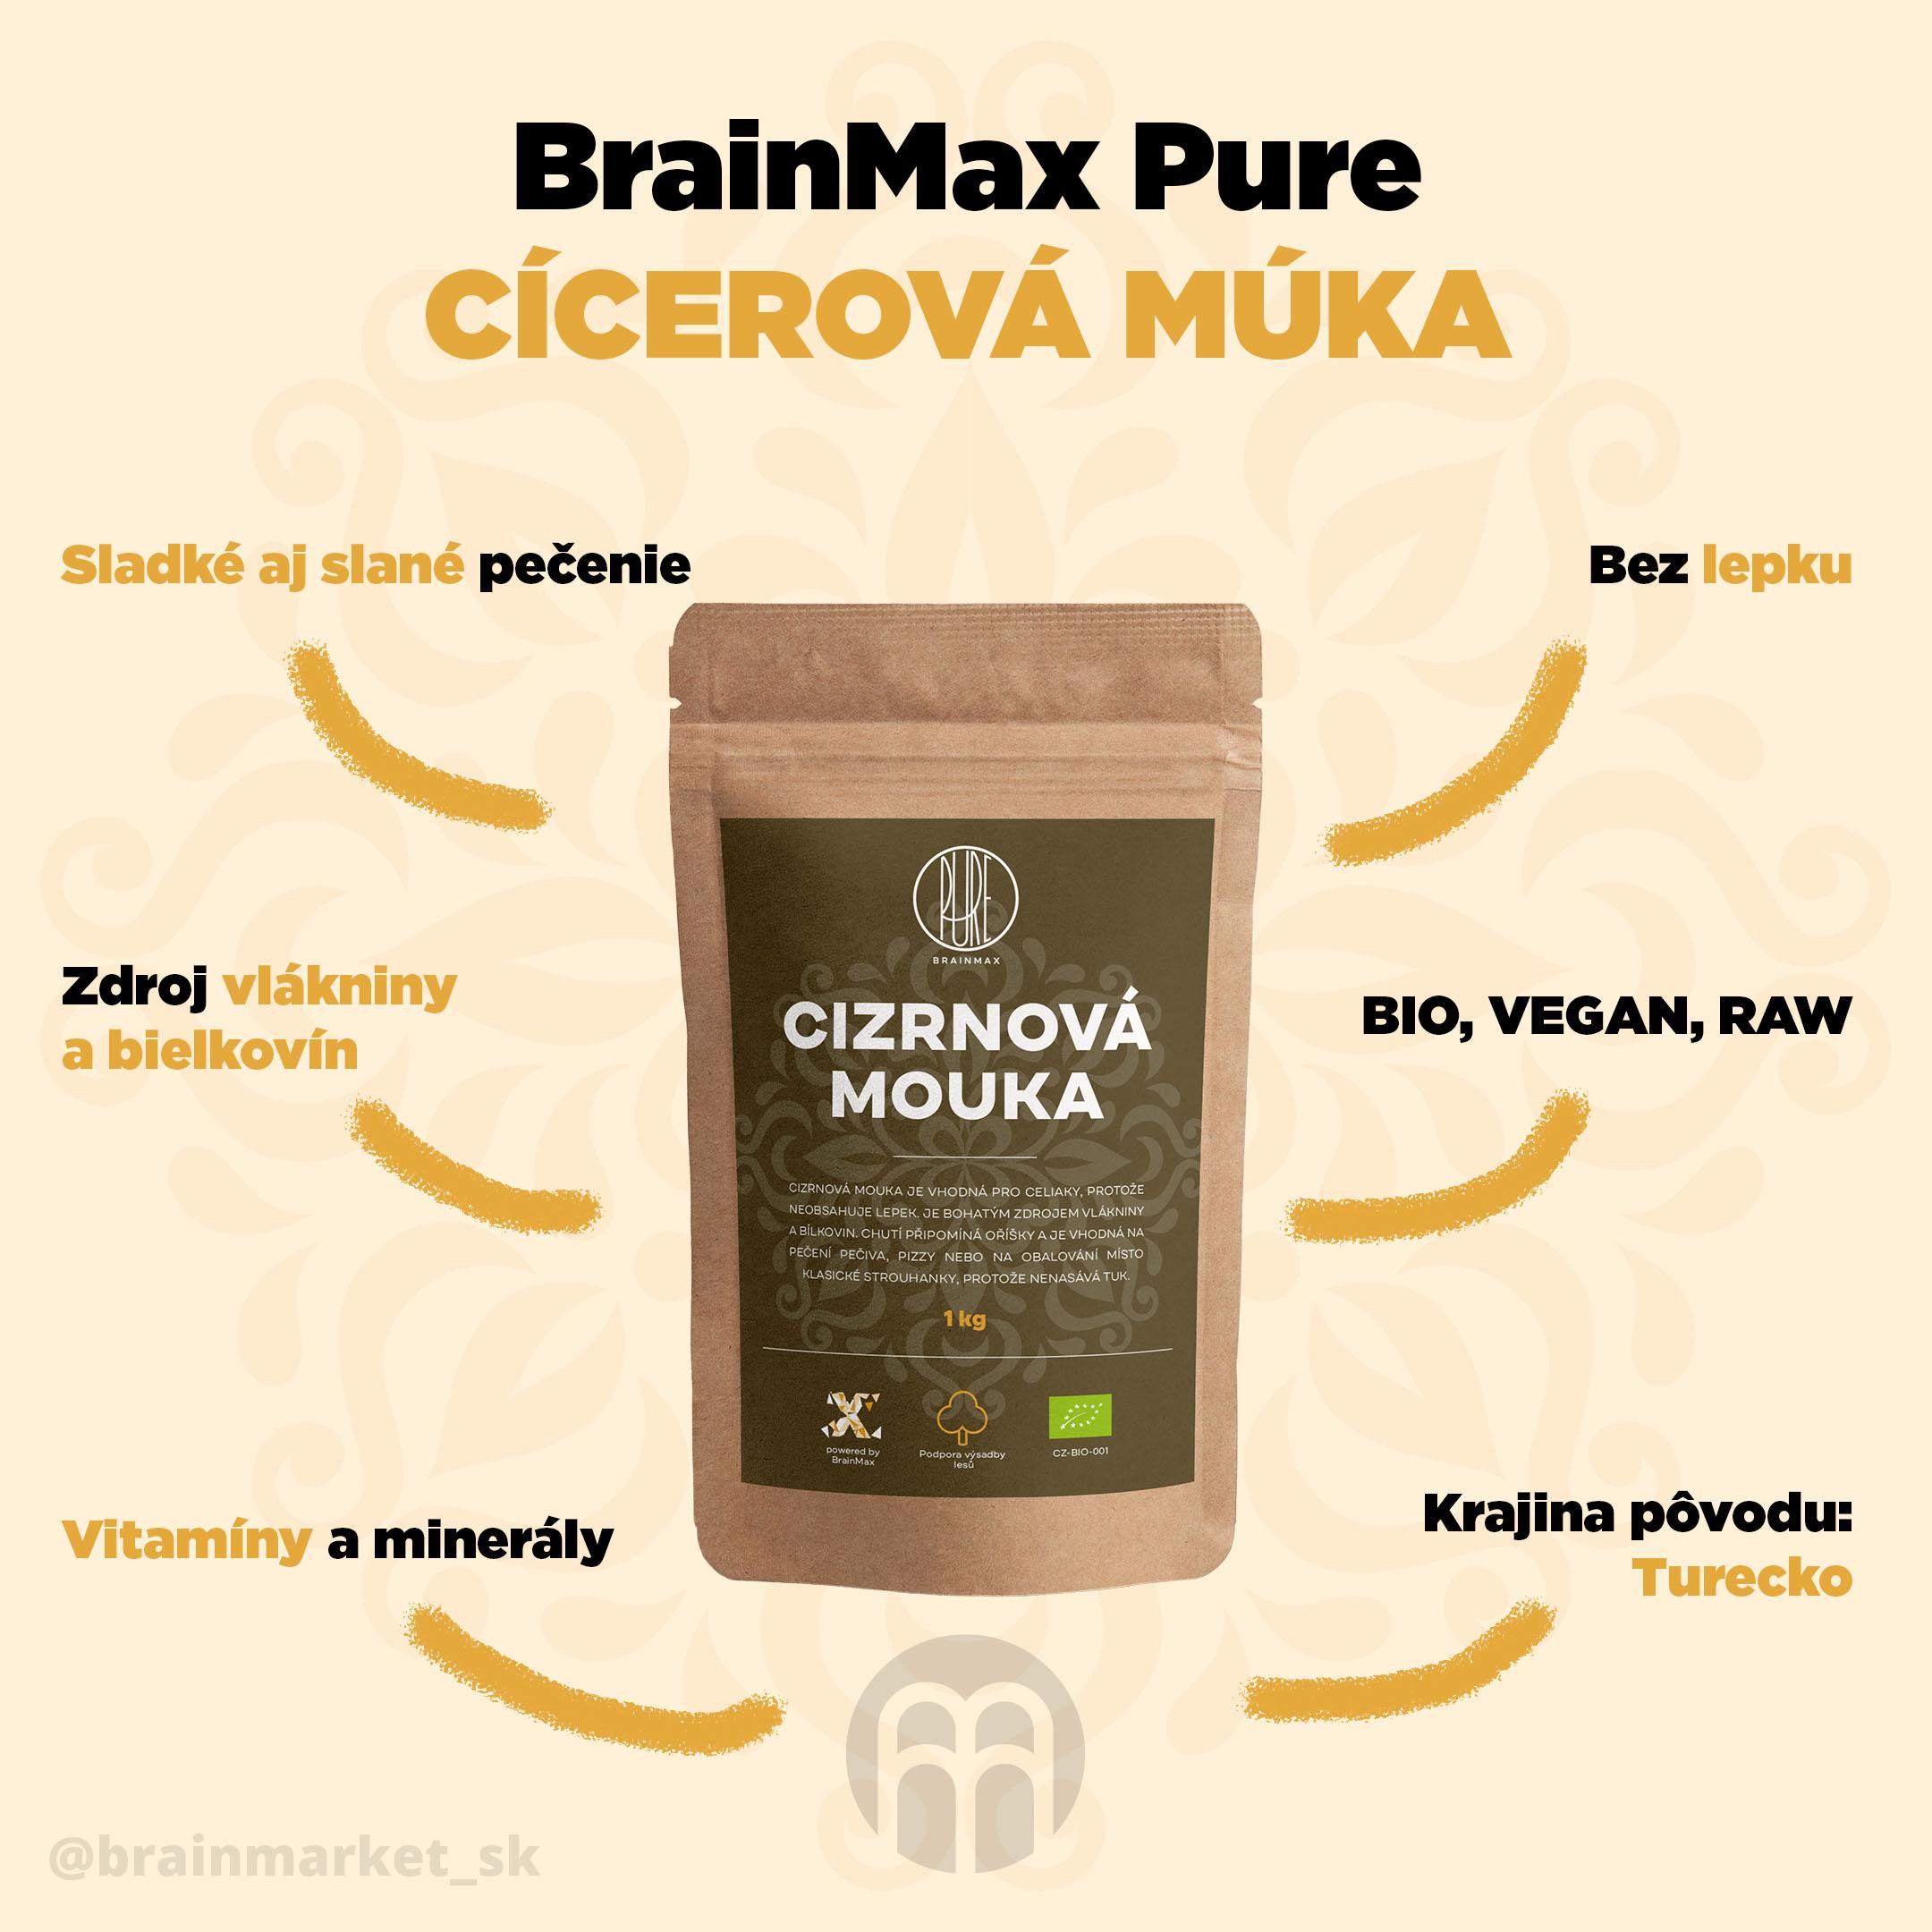 cicerova_muka_infografika_brainmarket_SK